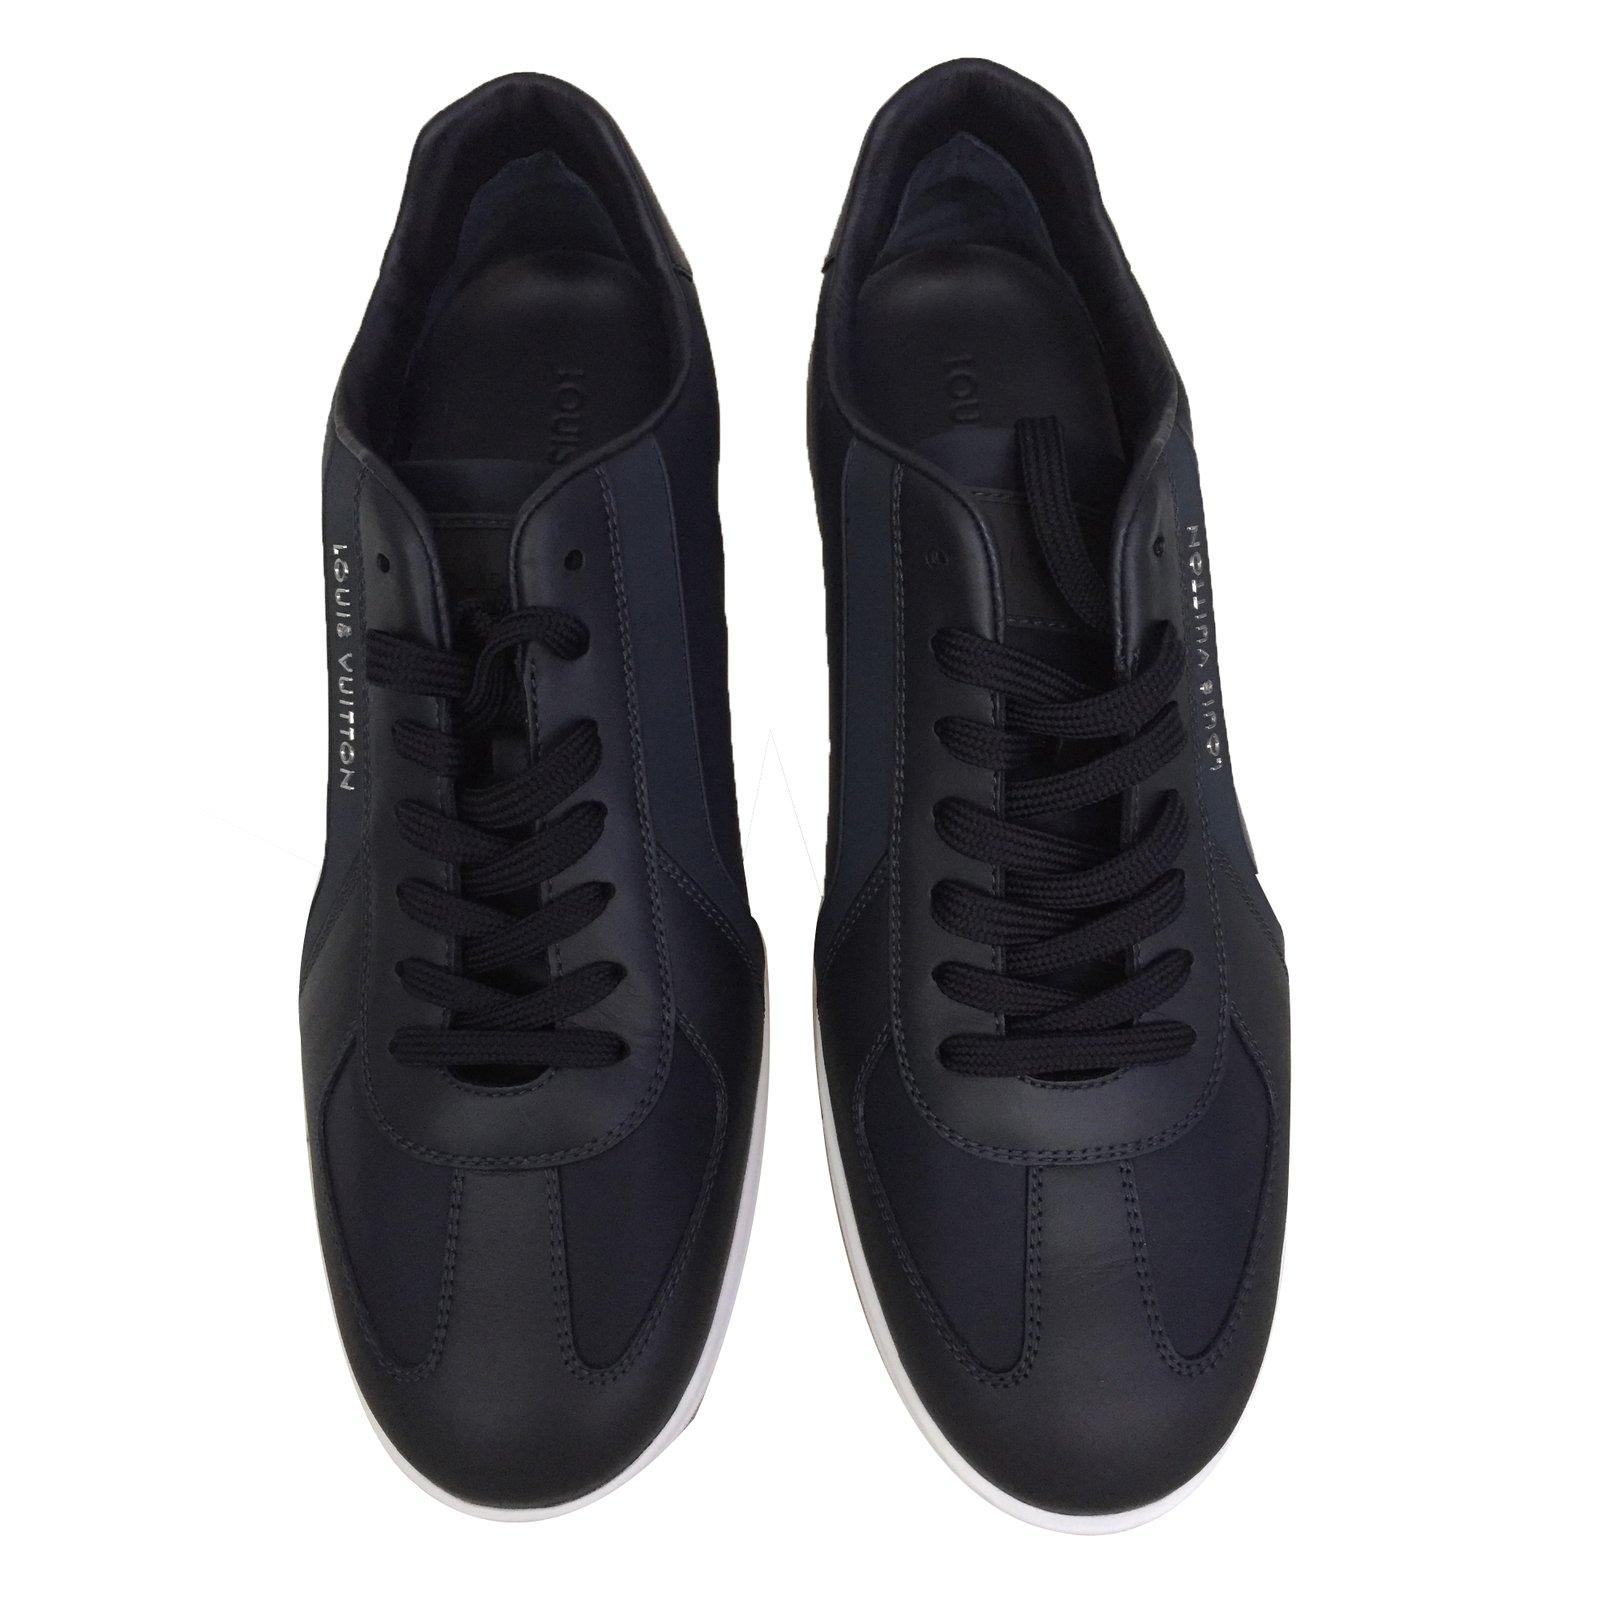 baskets homme louis vuitton basket pulse sneakers cuir. Black Bedroom Furniture Sets. Home Design Ideas